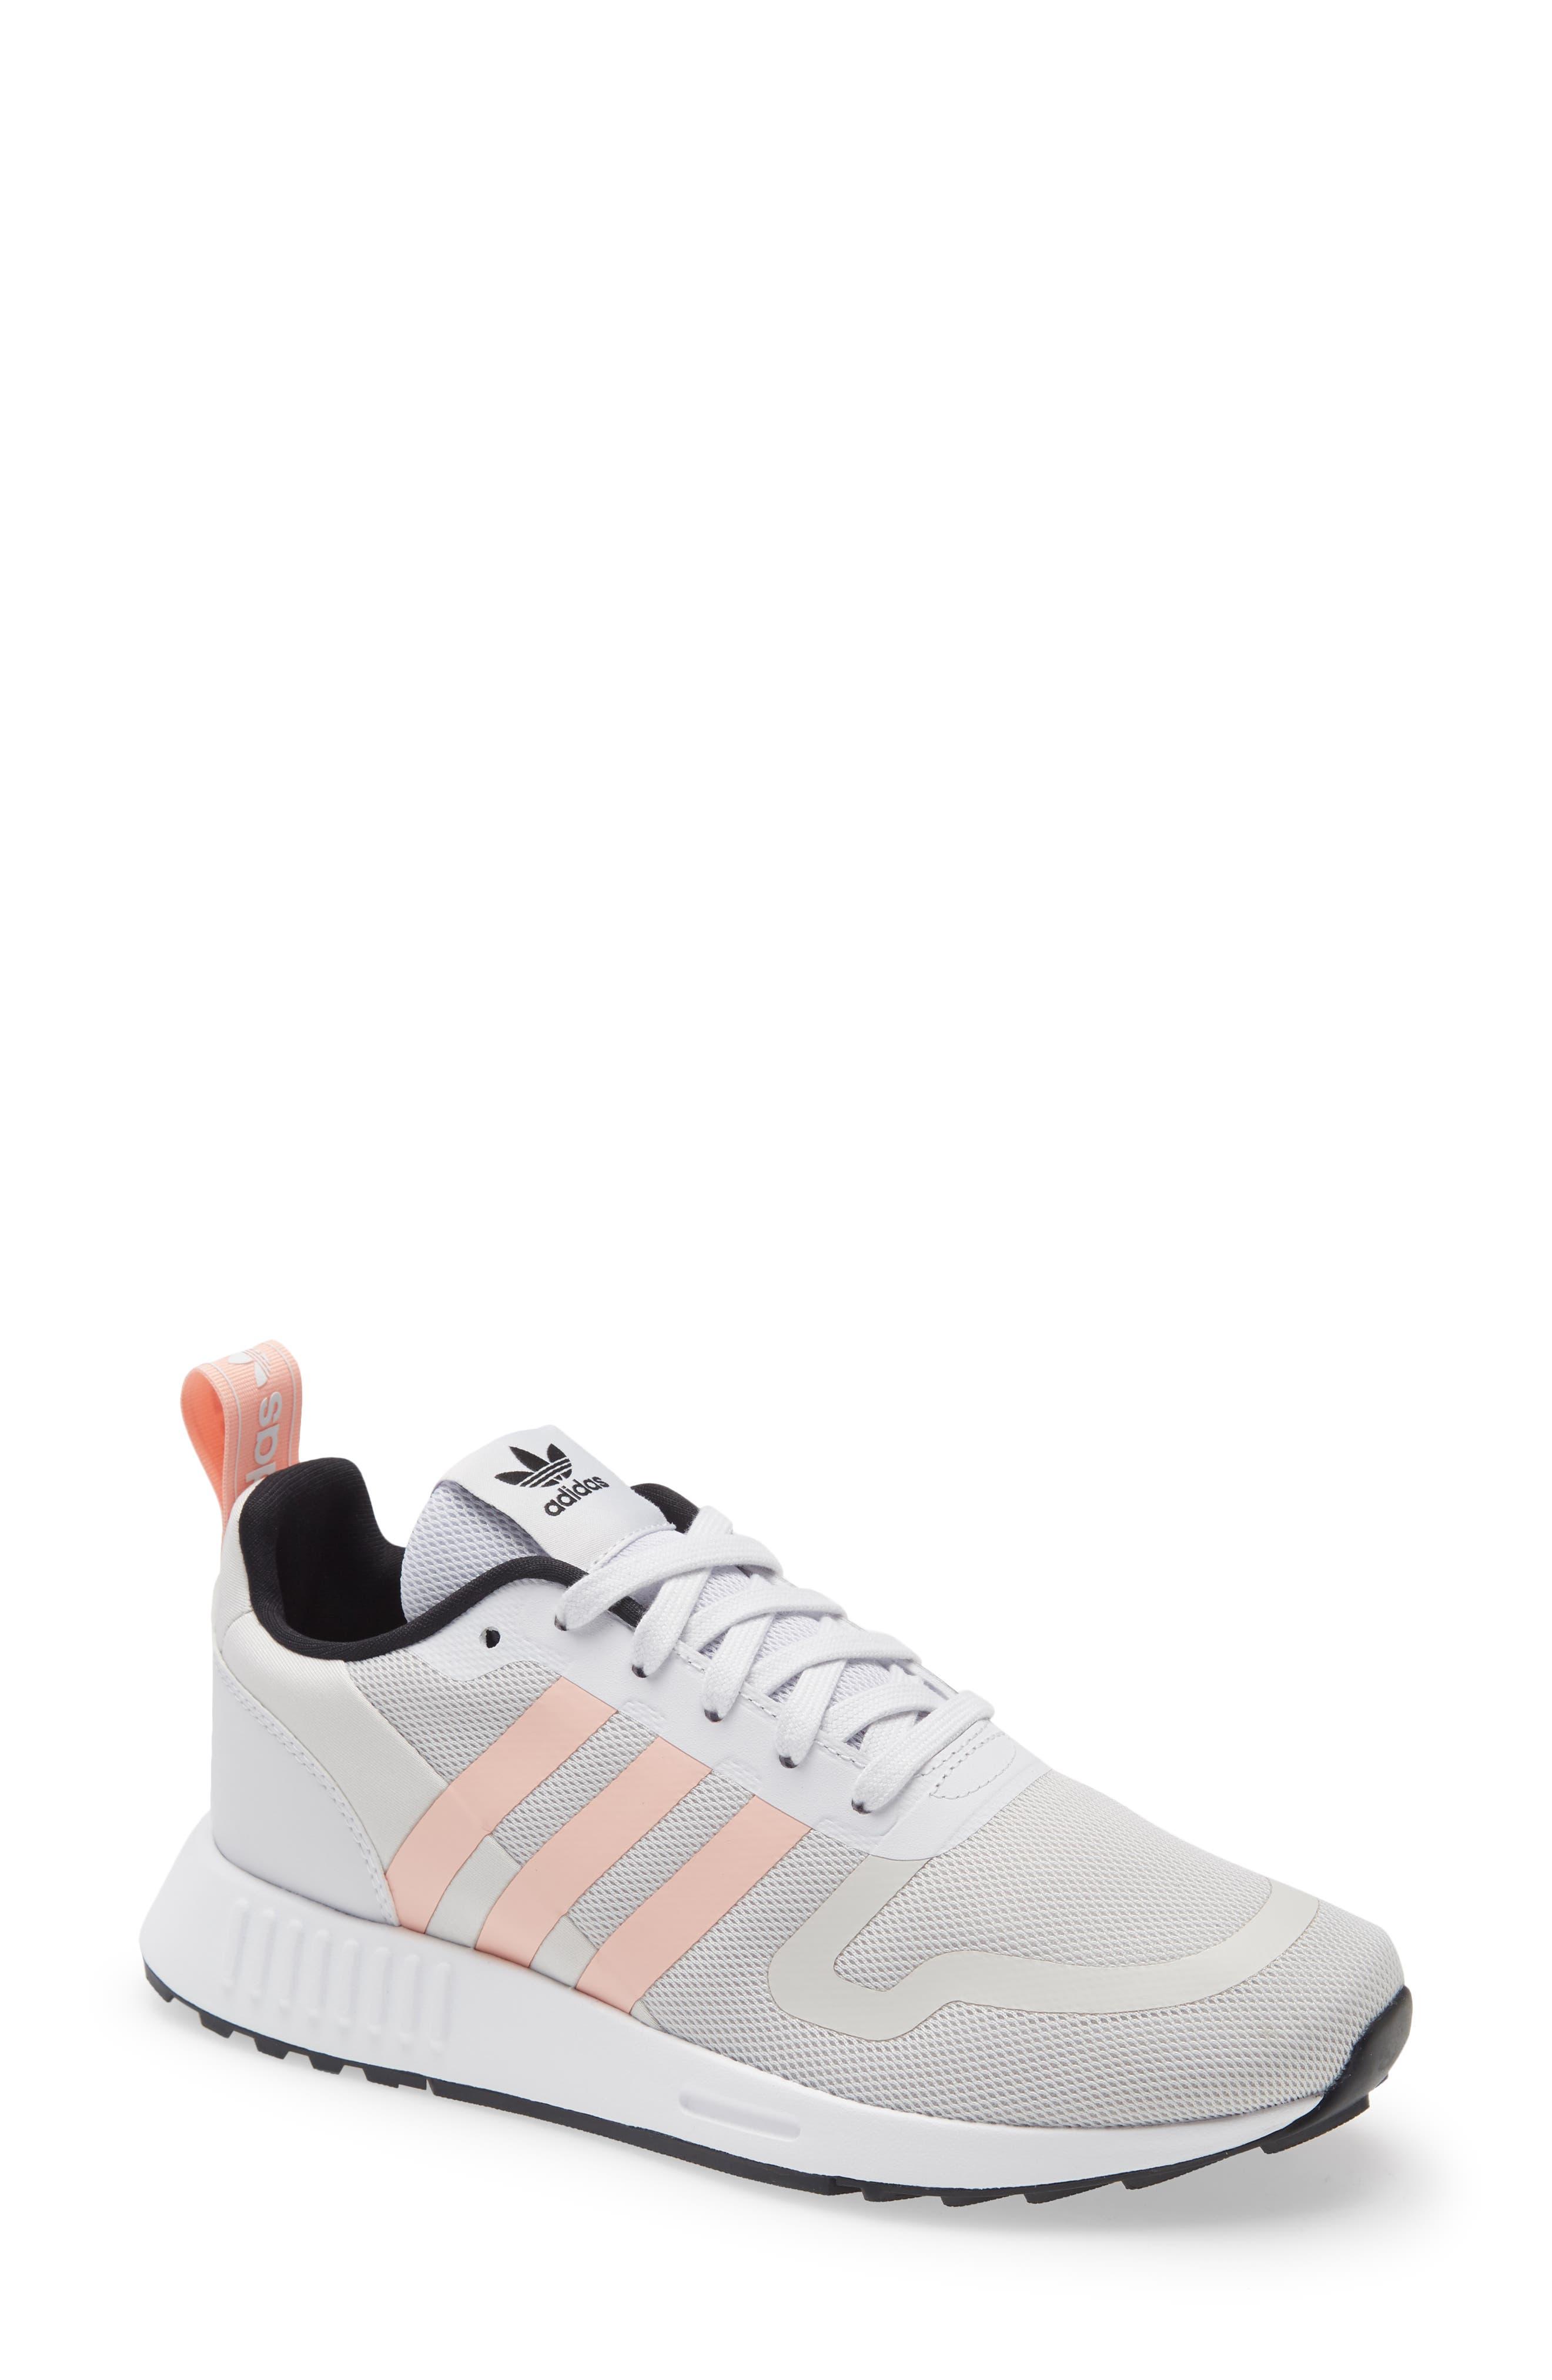 adidas Big Kid Shoes (Sizes 3.5-7) | Nordstrom